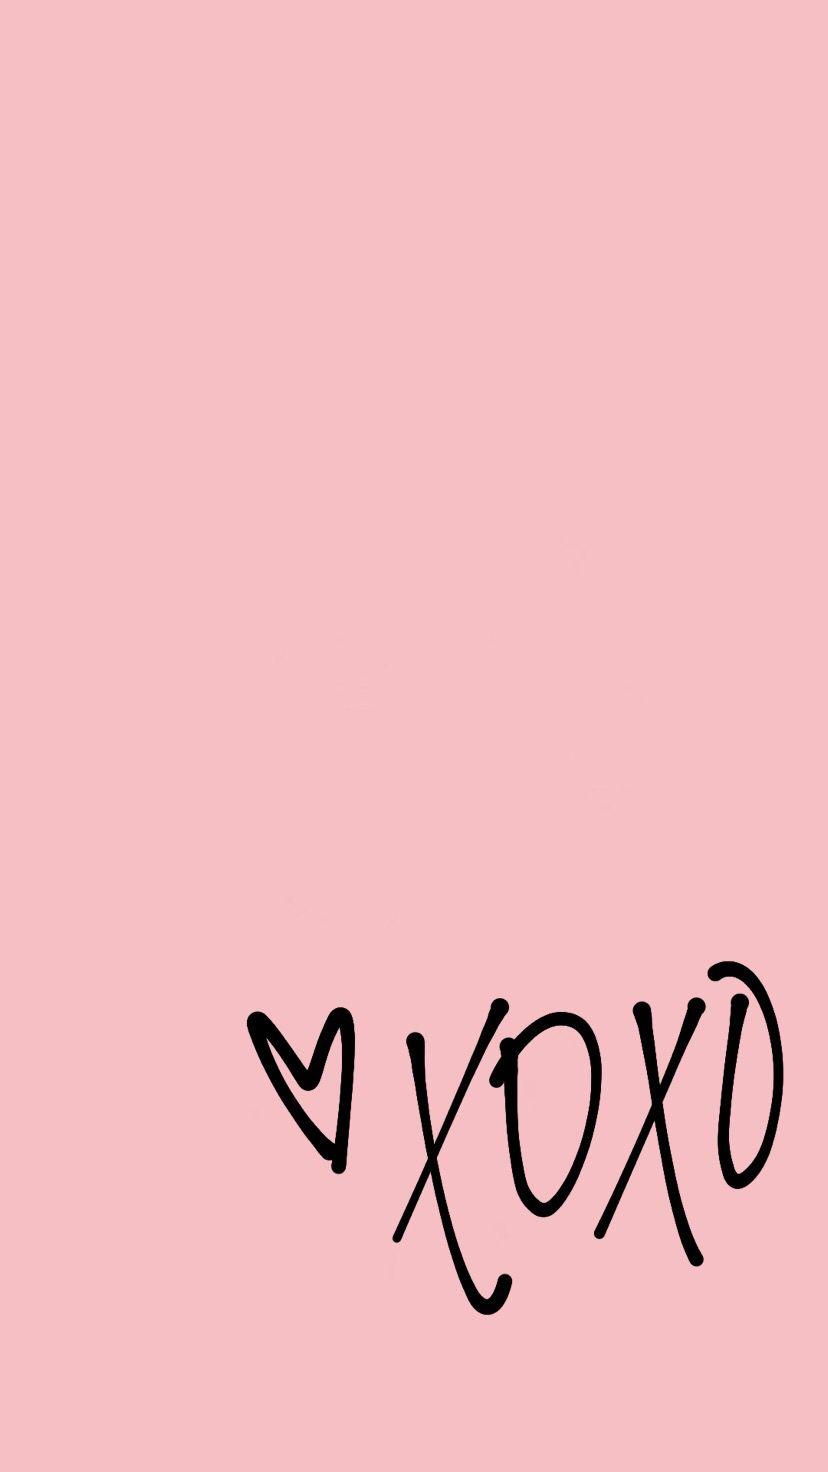 Xoxo Pink Wallpapers on WallpaperDog